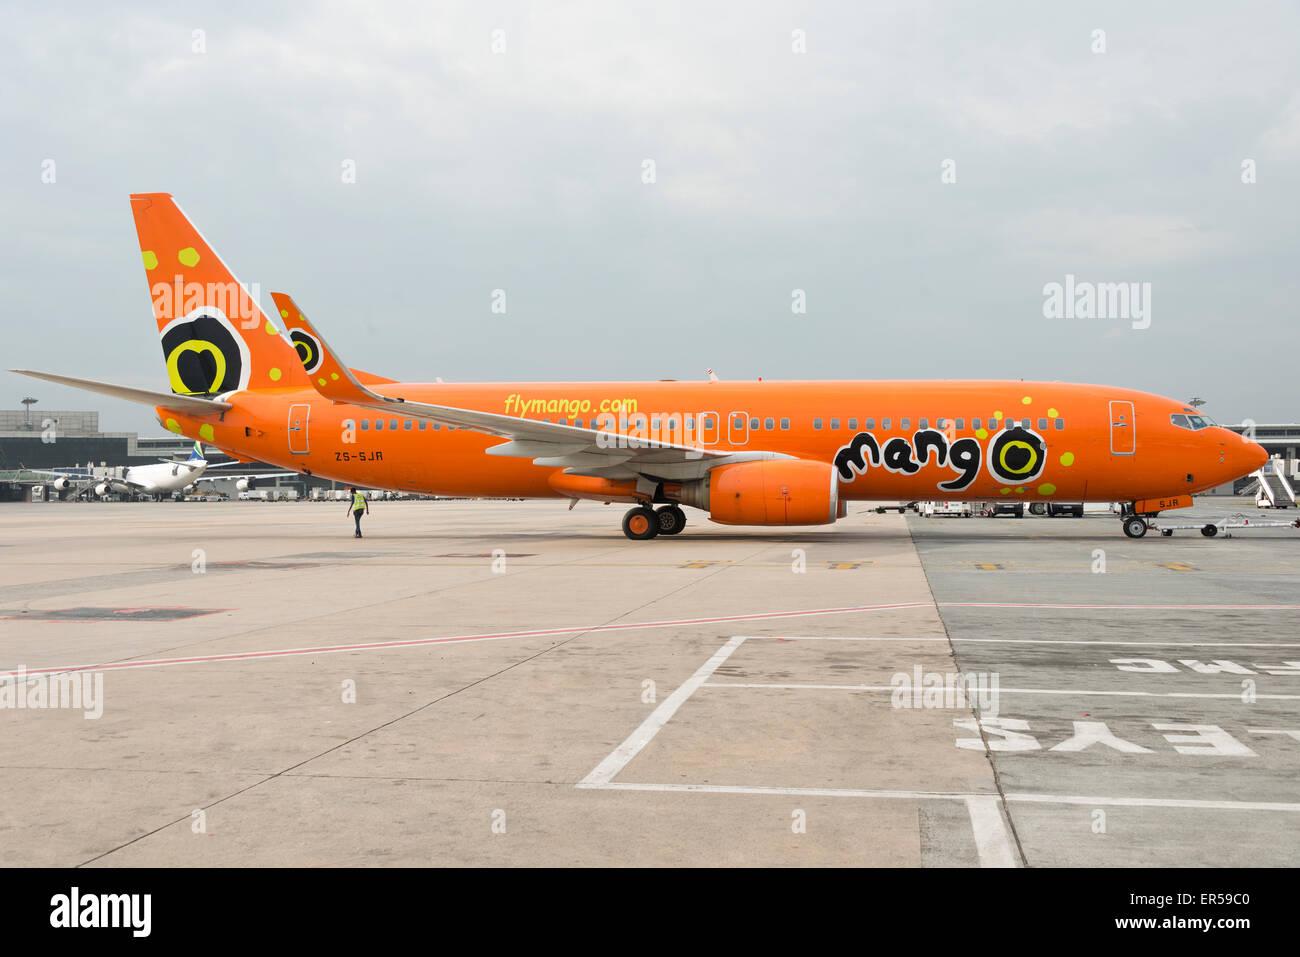 Mango Airlines Boeing 737 aircraft at O.R.Tambo International Airport, Johannesburg, Gauteng, Republic of South - Stock Image